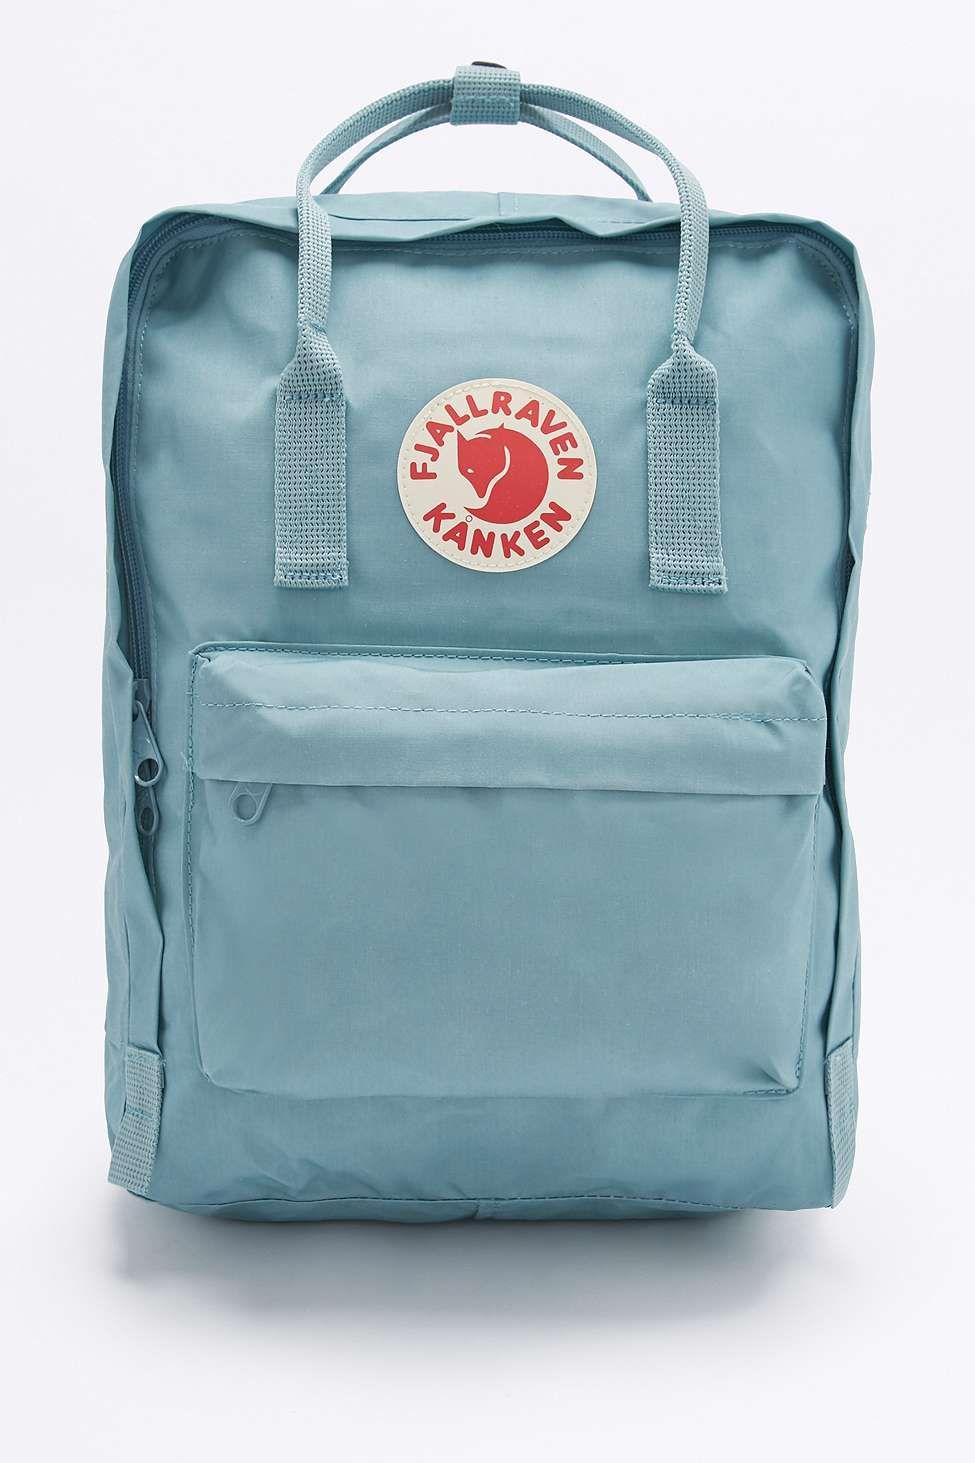 1fad553e0 Fjallraven Kanken Classic Sky Blue Backpack